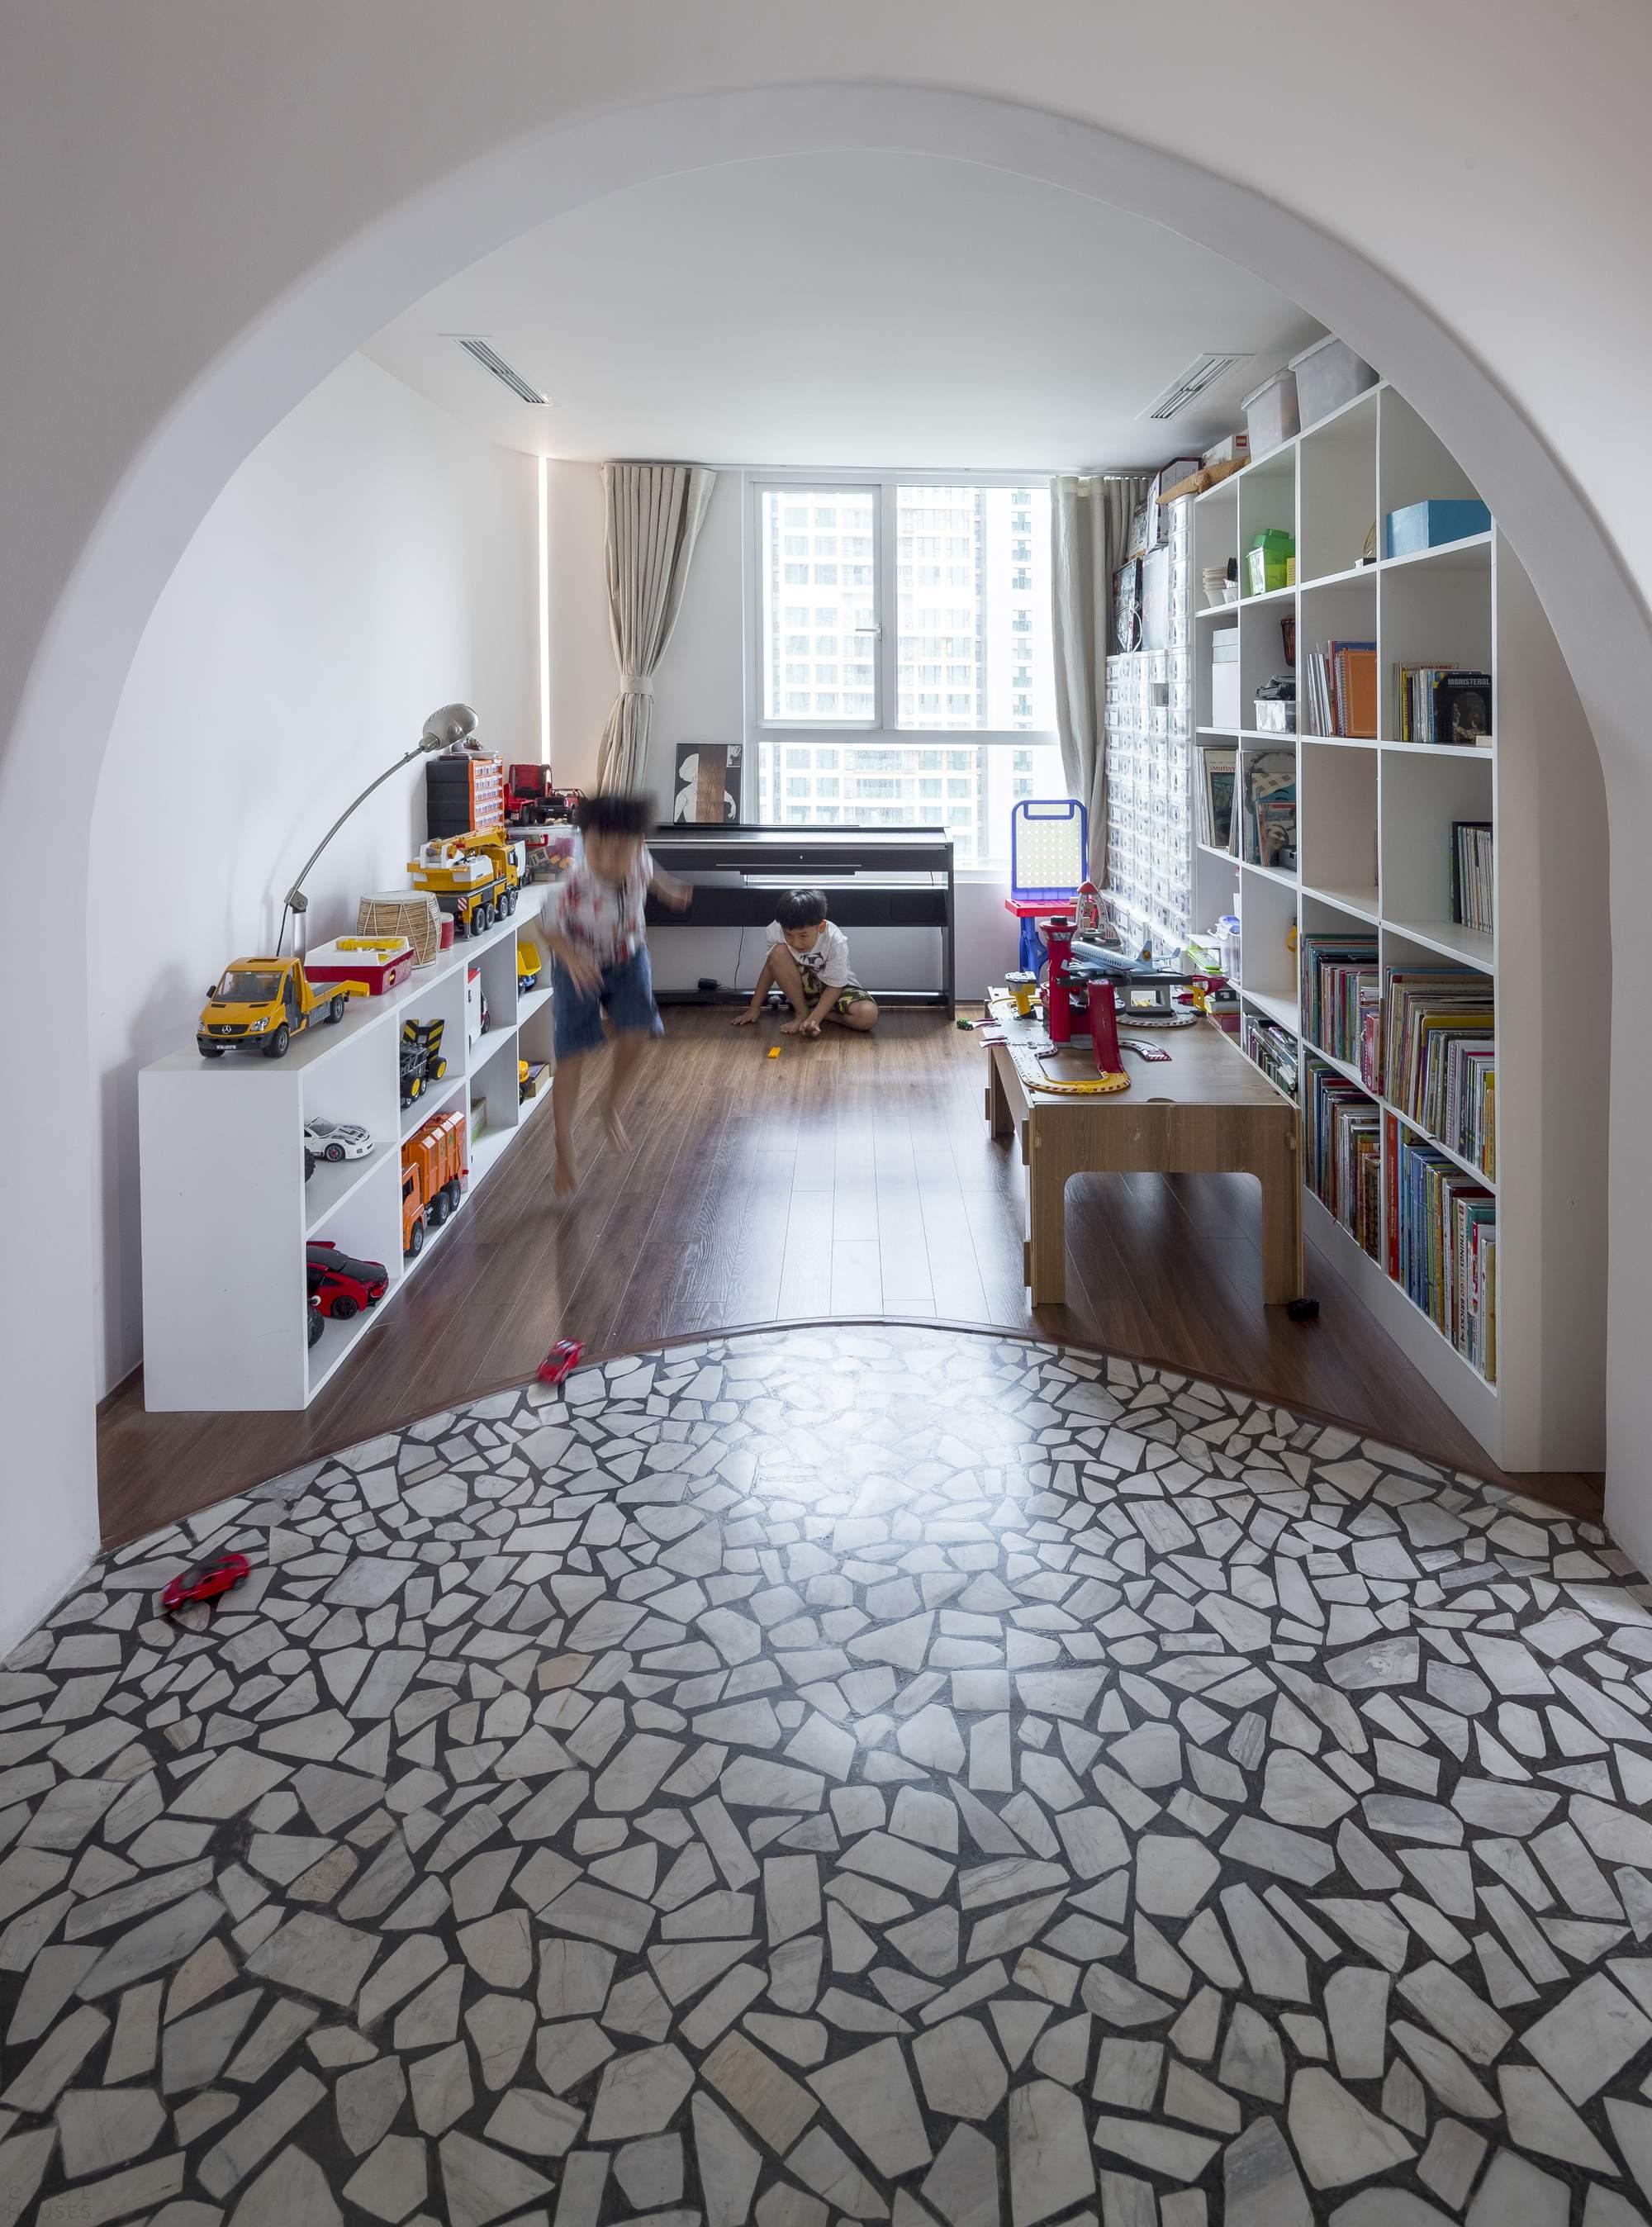 Двухуровневые апартаменты с модернистскими мотивами, Вьетнам